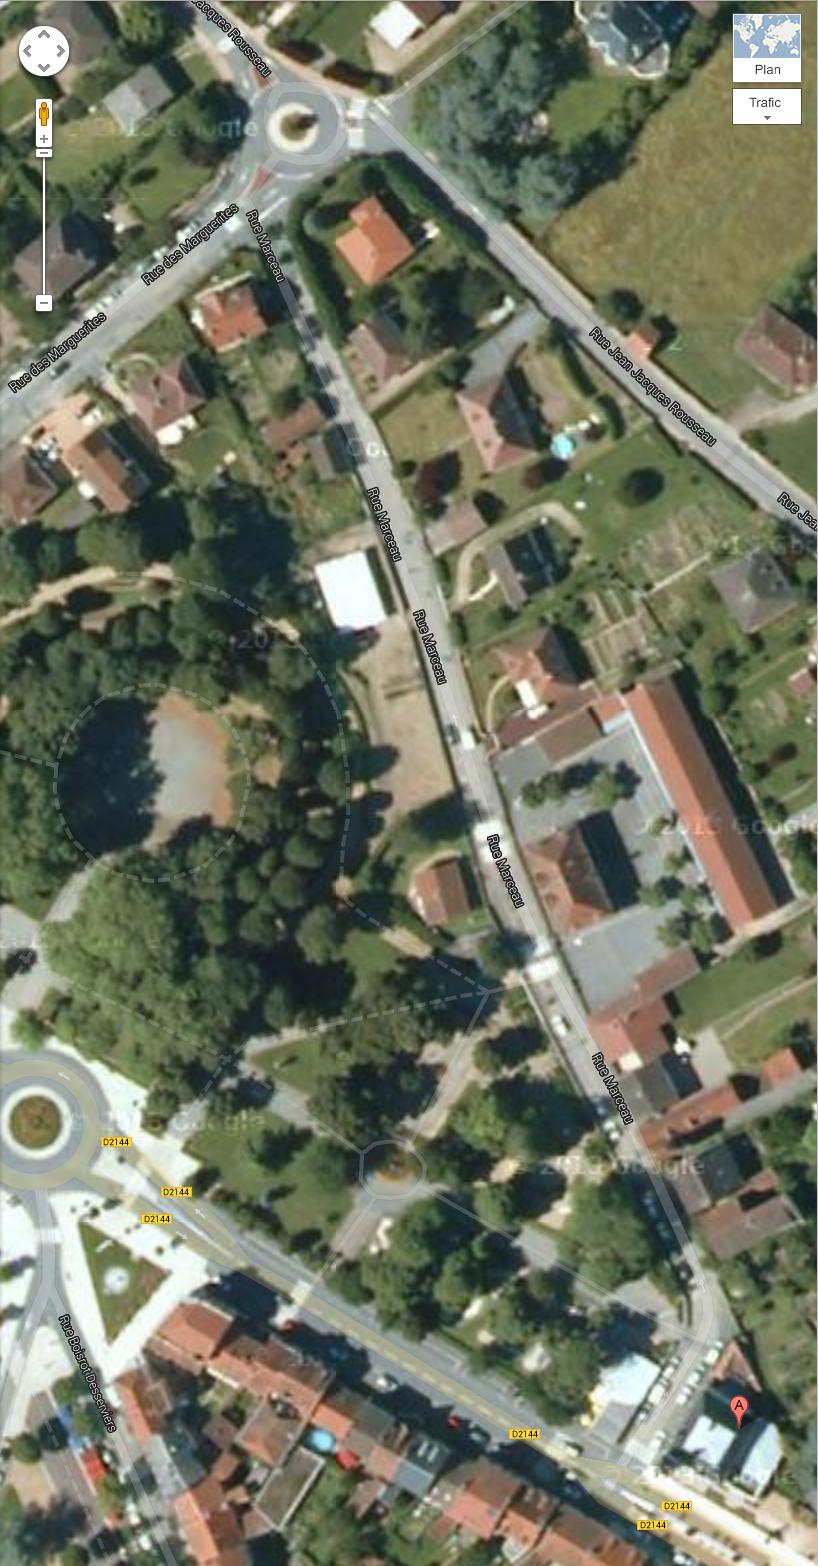 https://www.google.fr/maps/search/Rue+Marceau,+N%C3%A9ris-les-Bains/@46.289811,2.659009,505m/data=!3m2!1e3!4b1?hl=fr